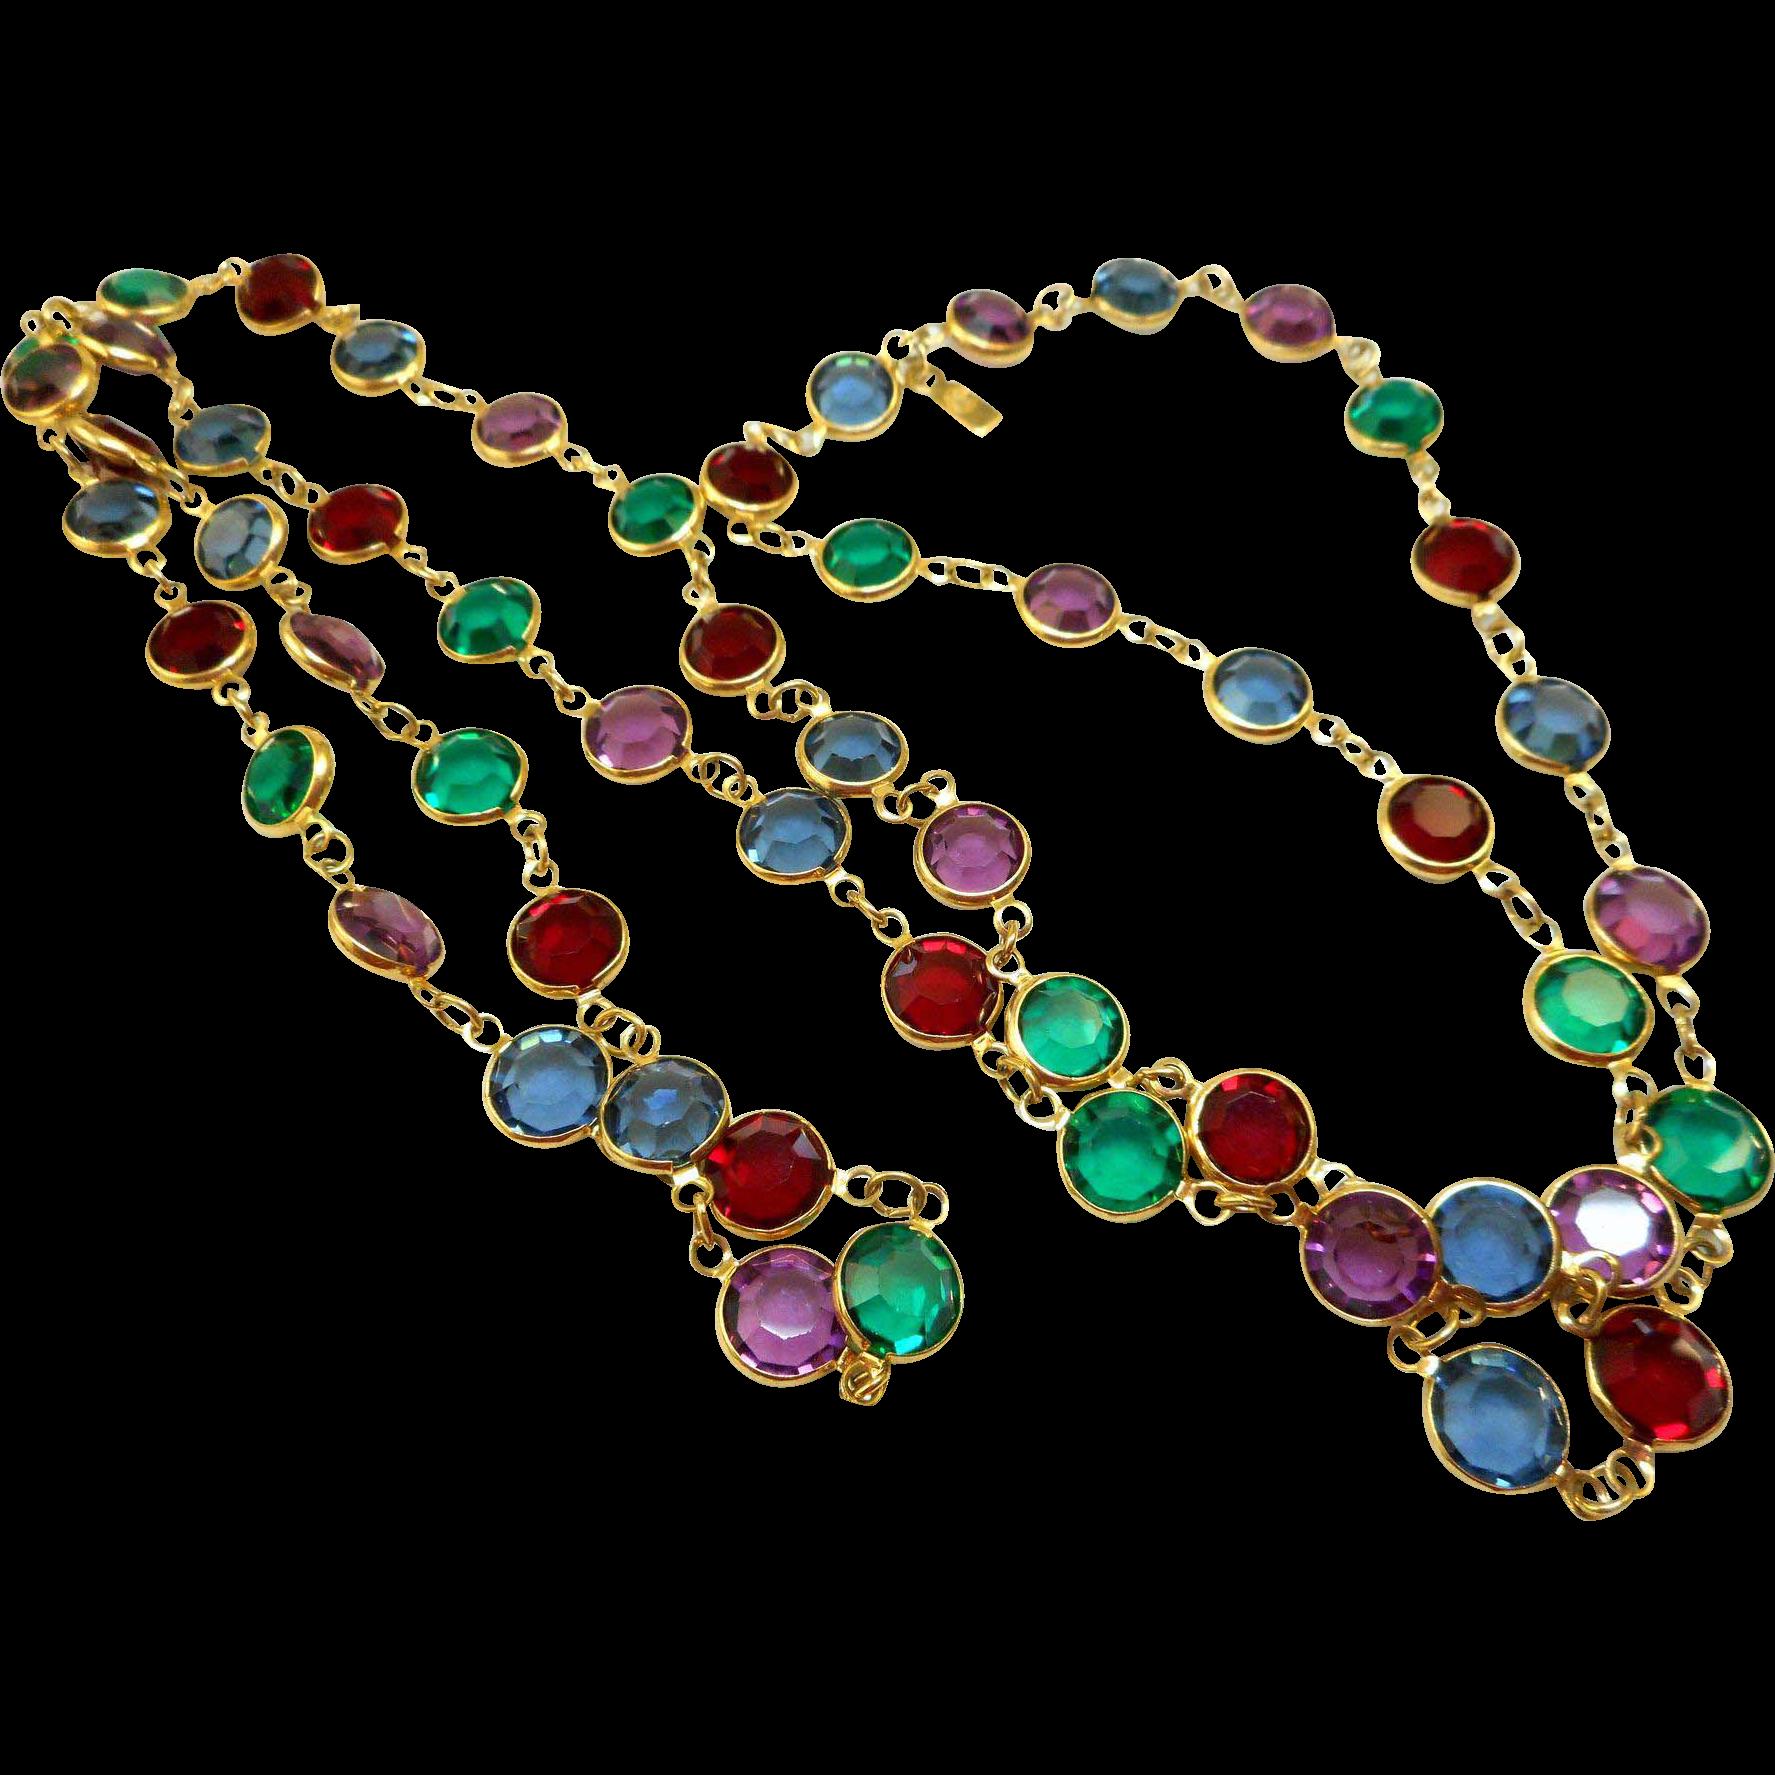 NOS Swarovski Necklace in Jewel Tones